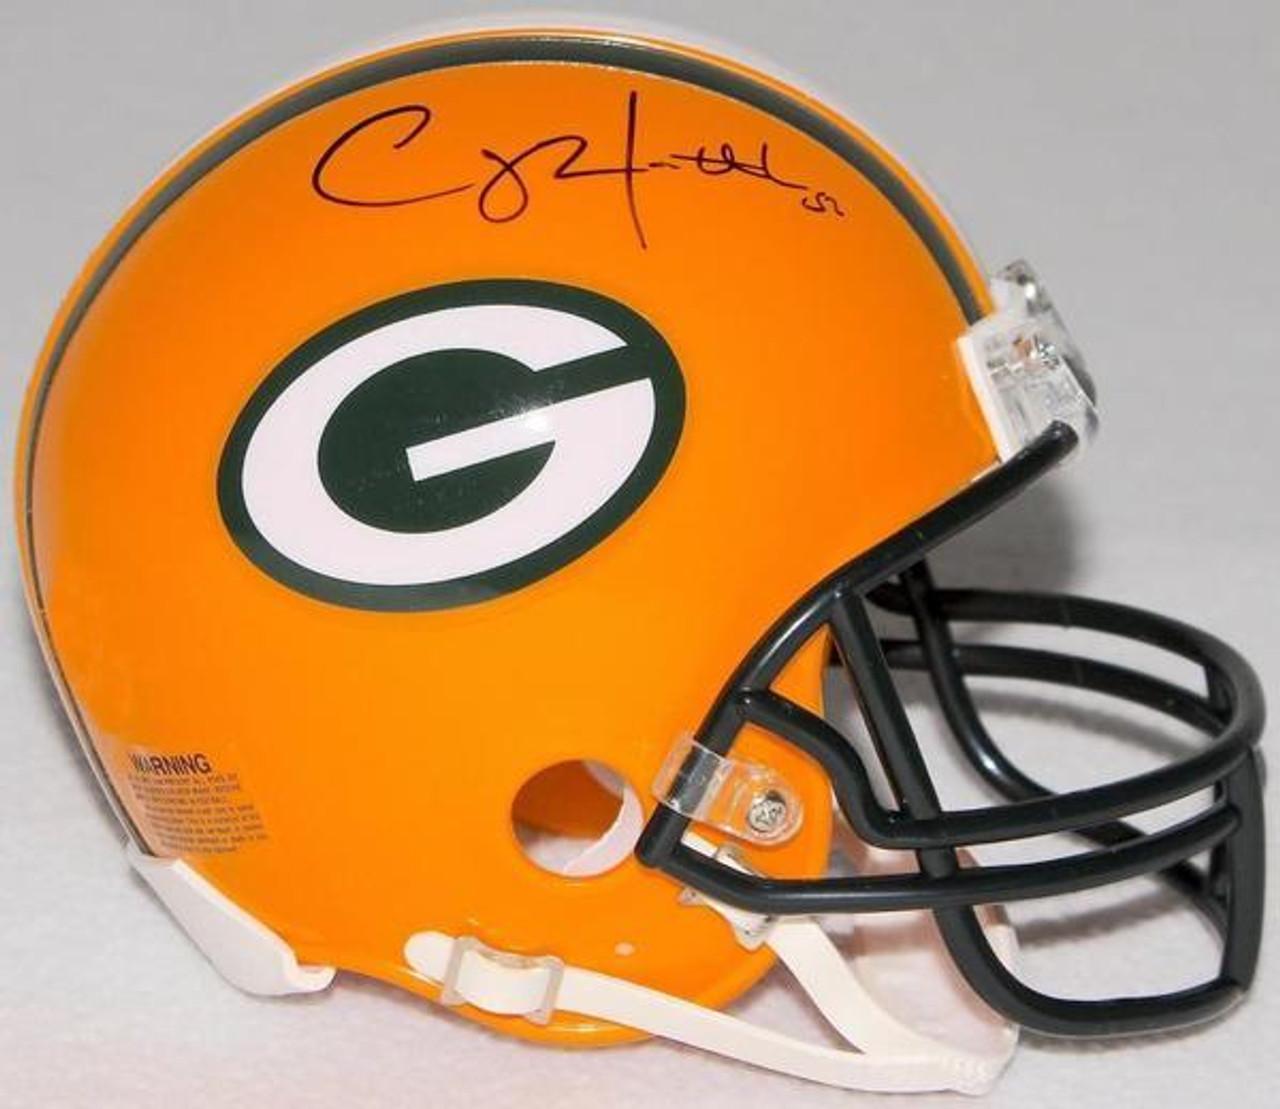 newest 64a84 f2a52 Clay Matthews Green Bay Packers Autographed Mini Football Helmet